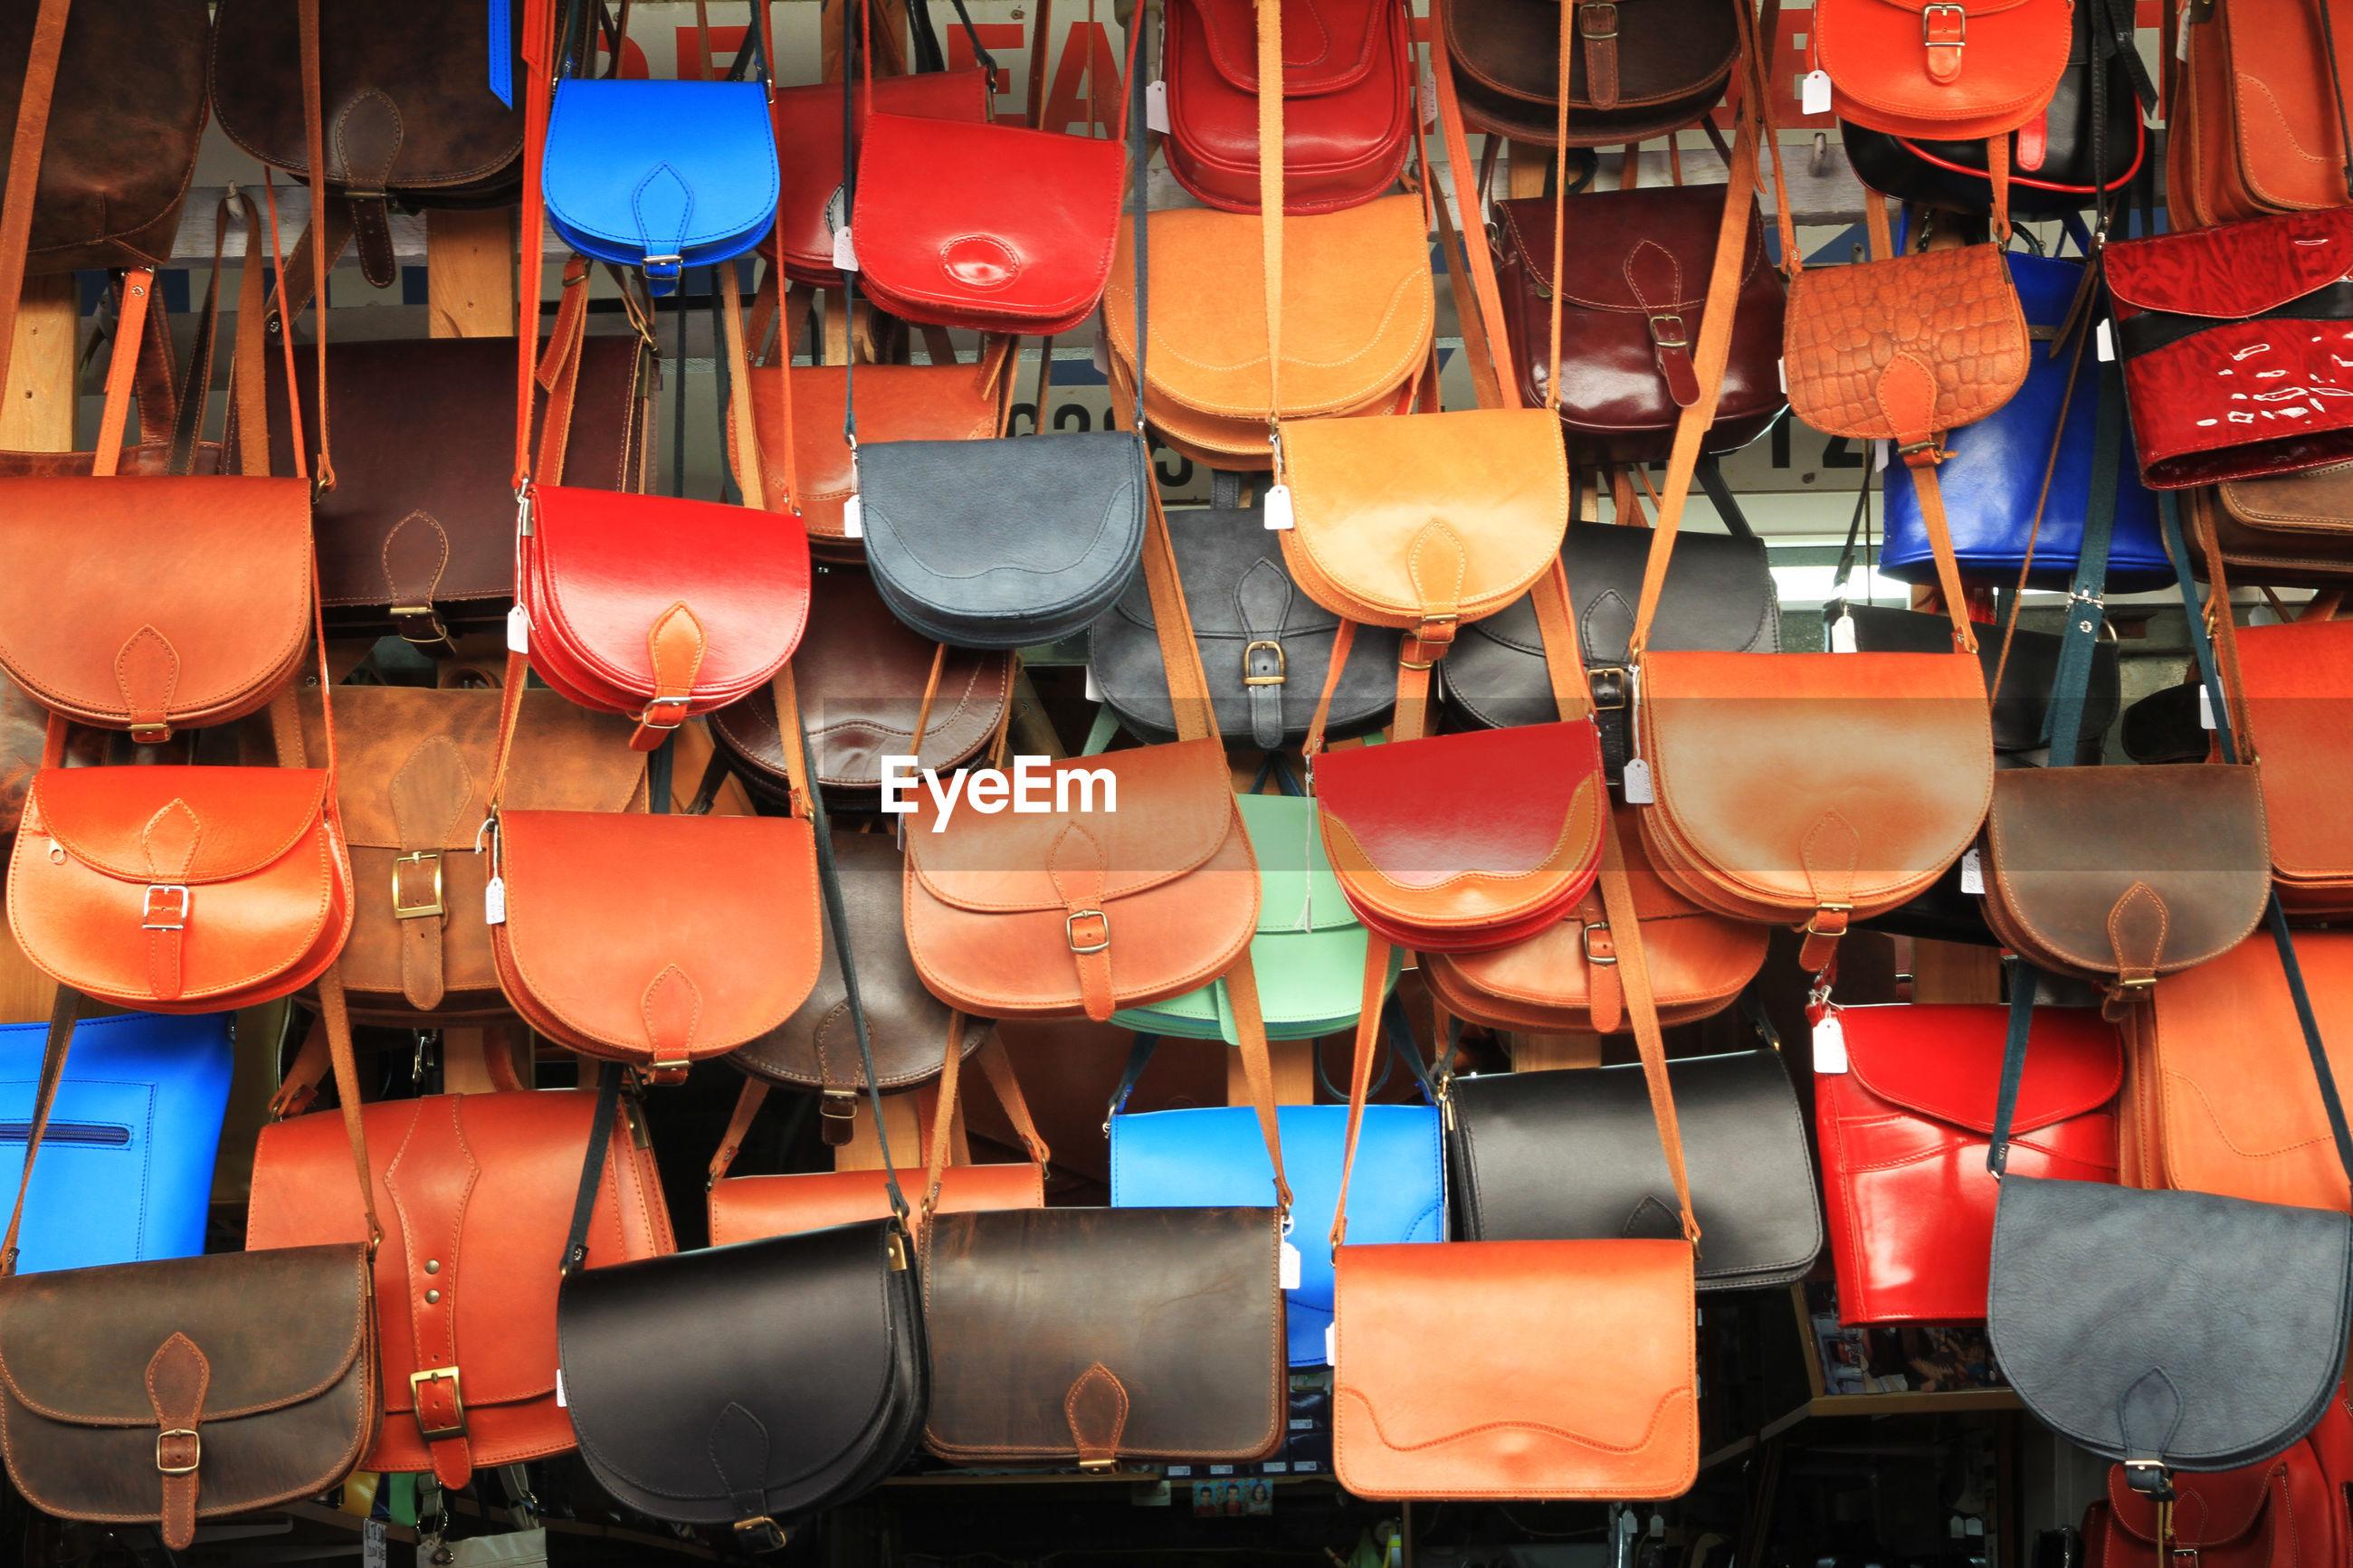 Full frame shot of purses for sale at market stall